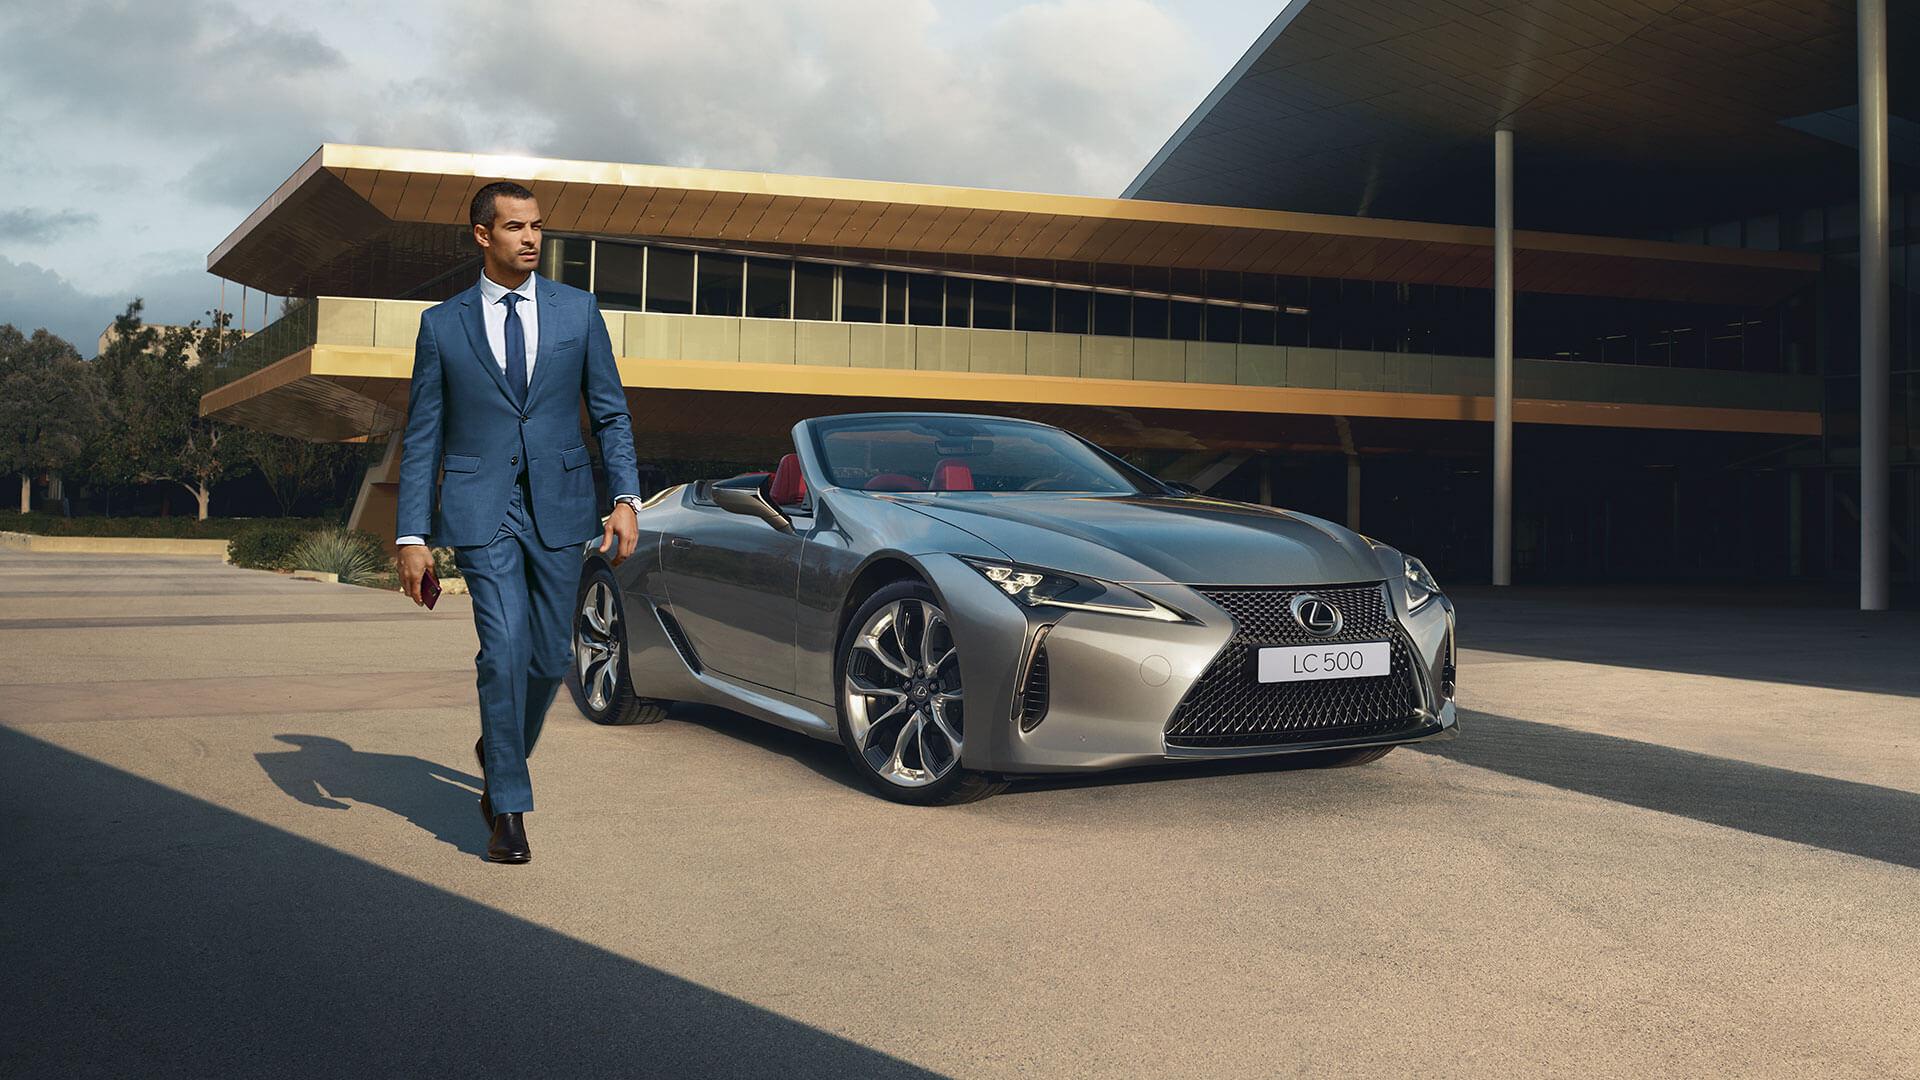 LC Convertible Best Luxury Car Award 01